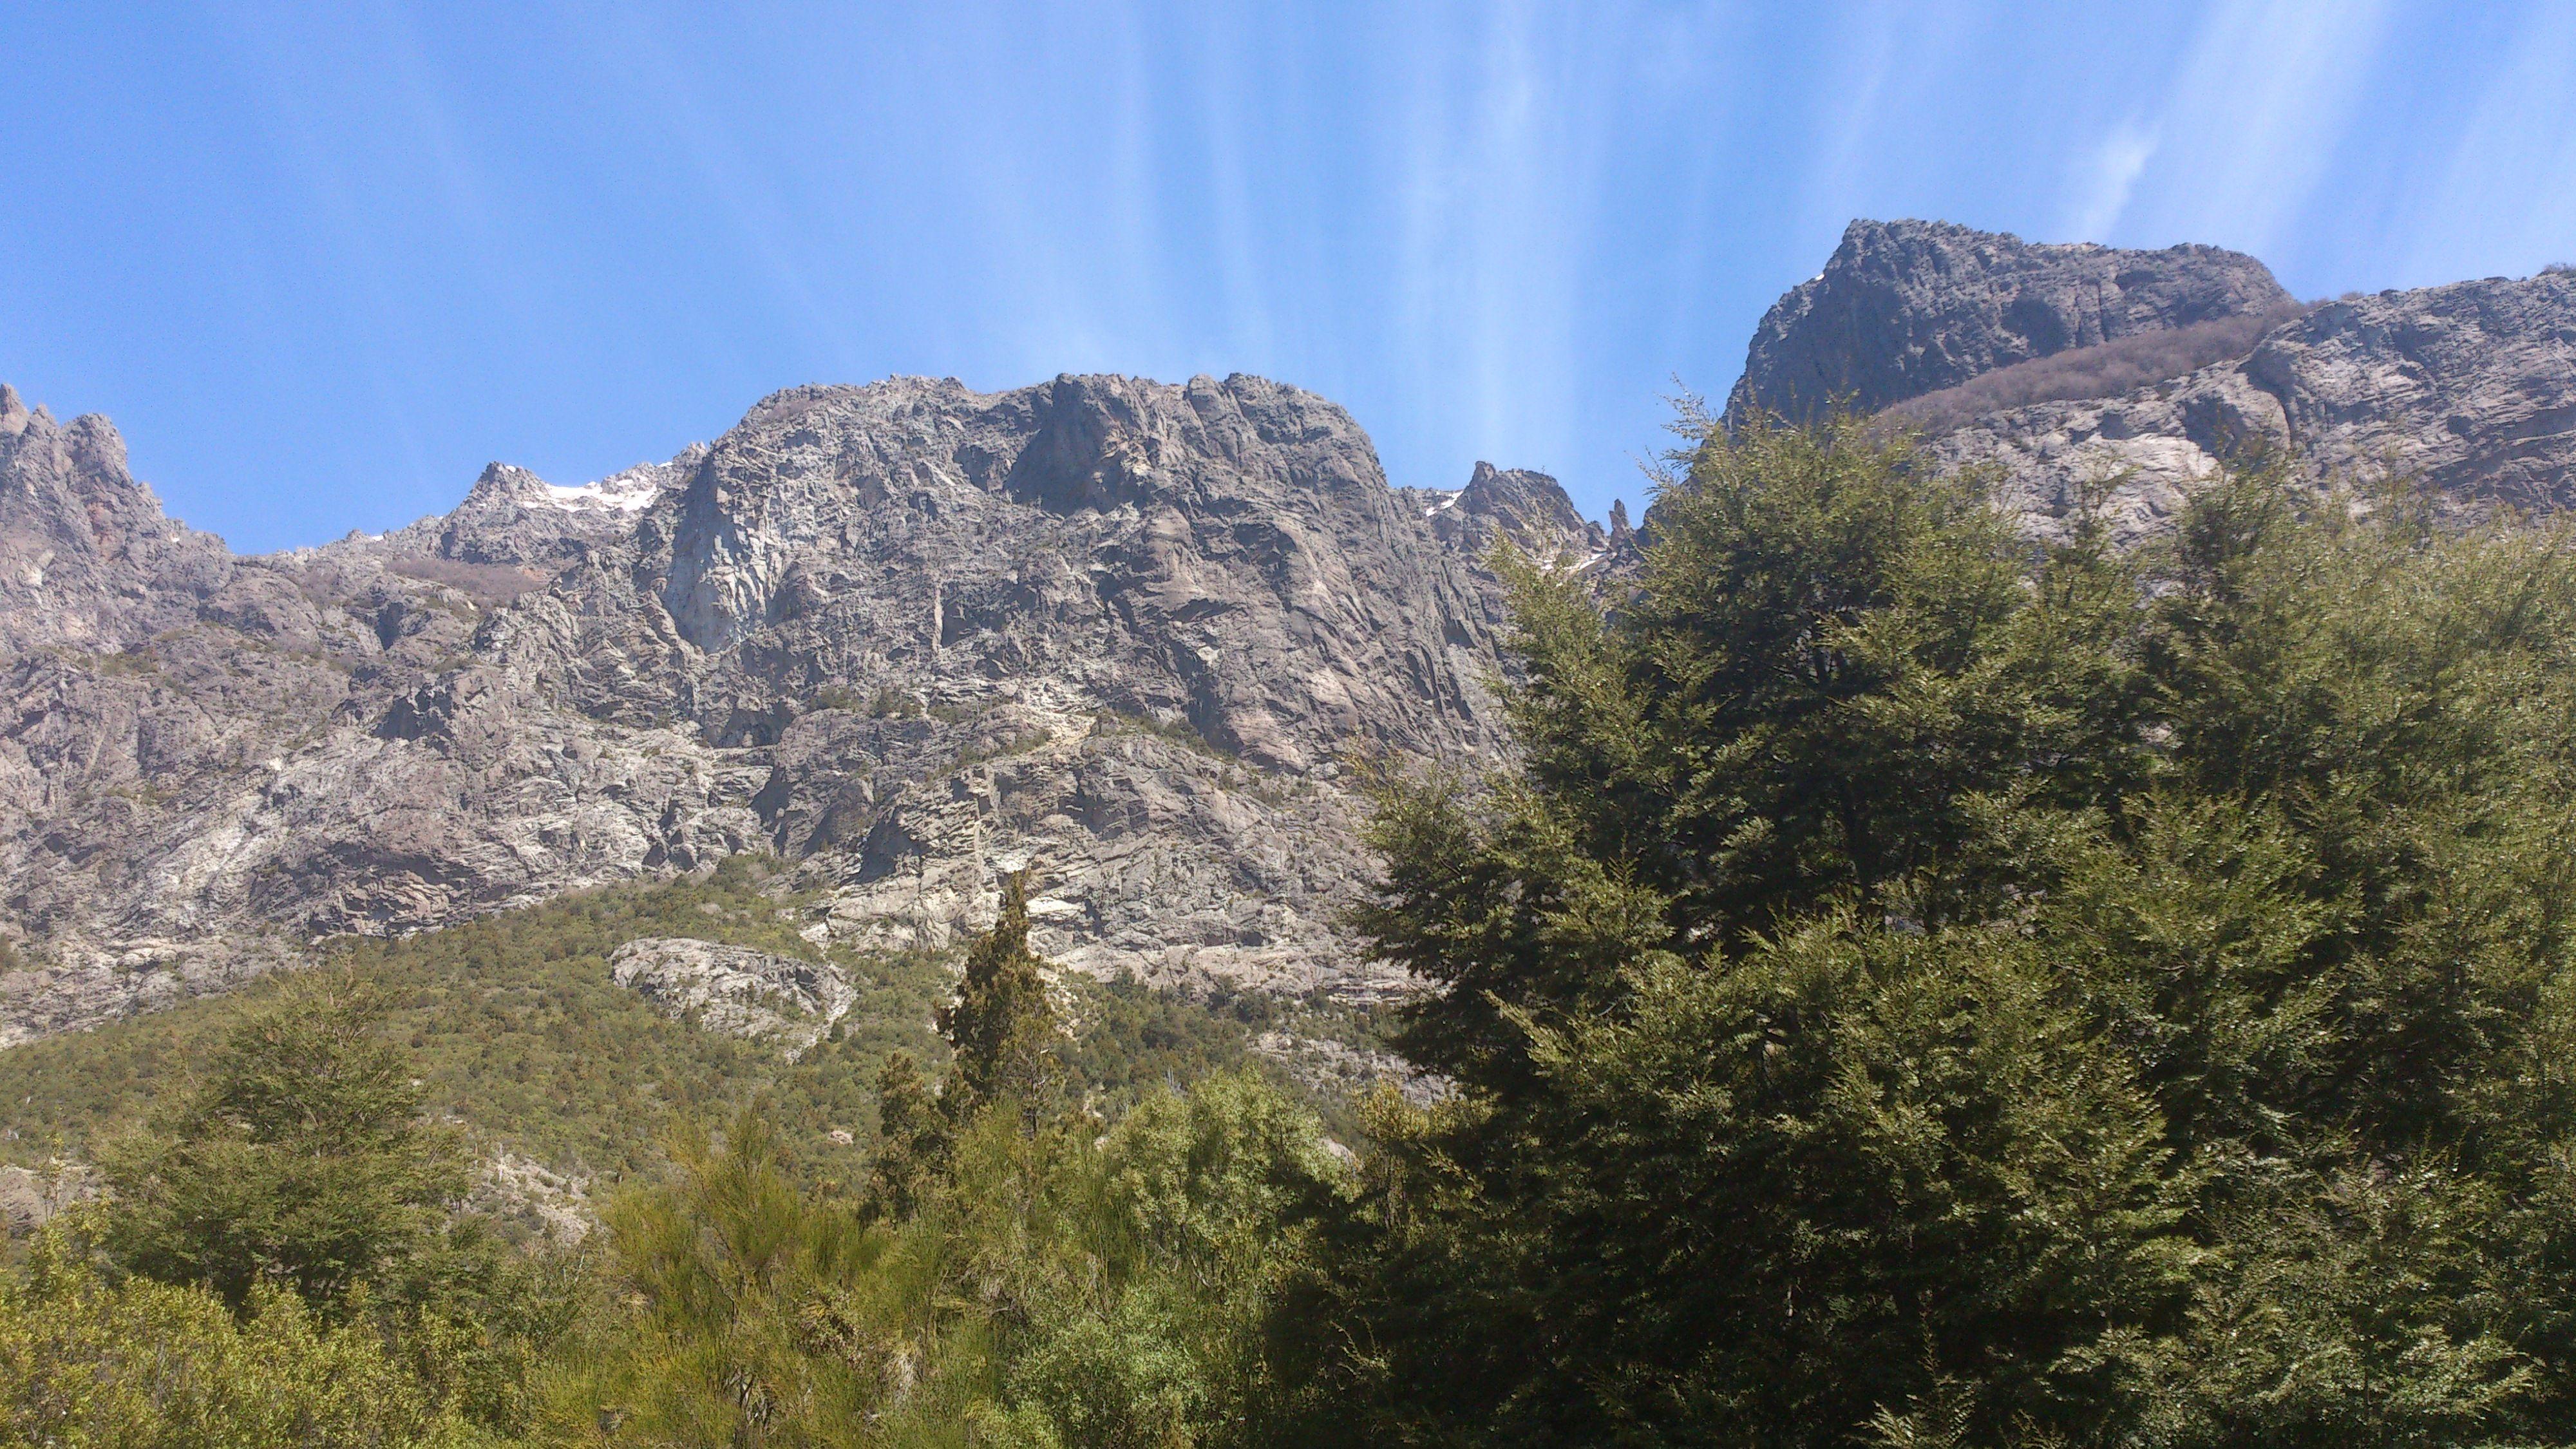 Circuito Chico : Lake nahuel huapi el circuito chico bariloche argentina